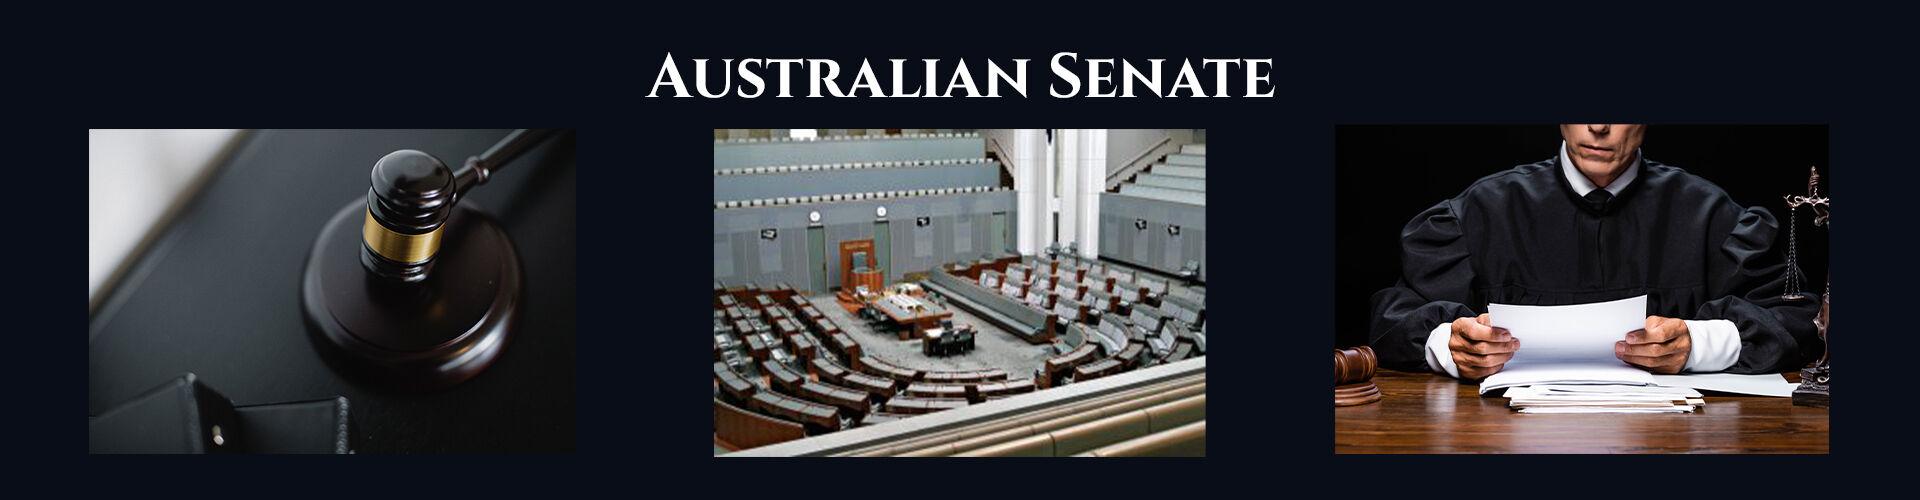 Absent Justice - Australian Senate